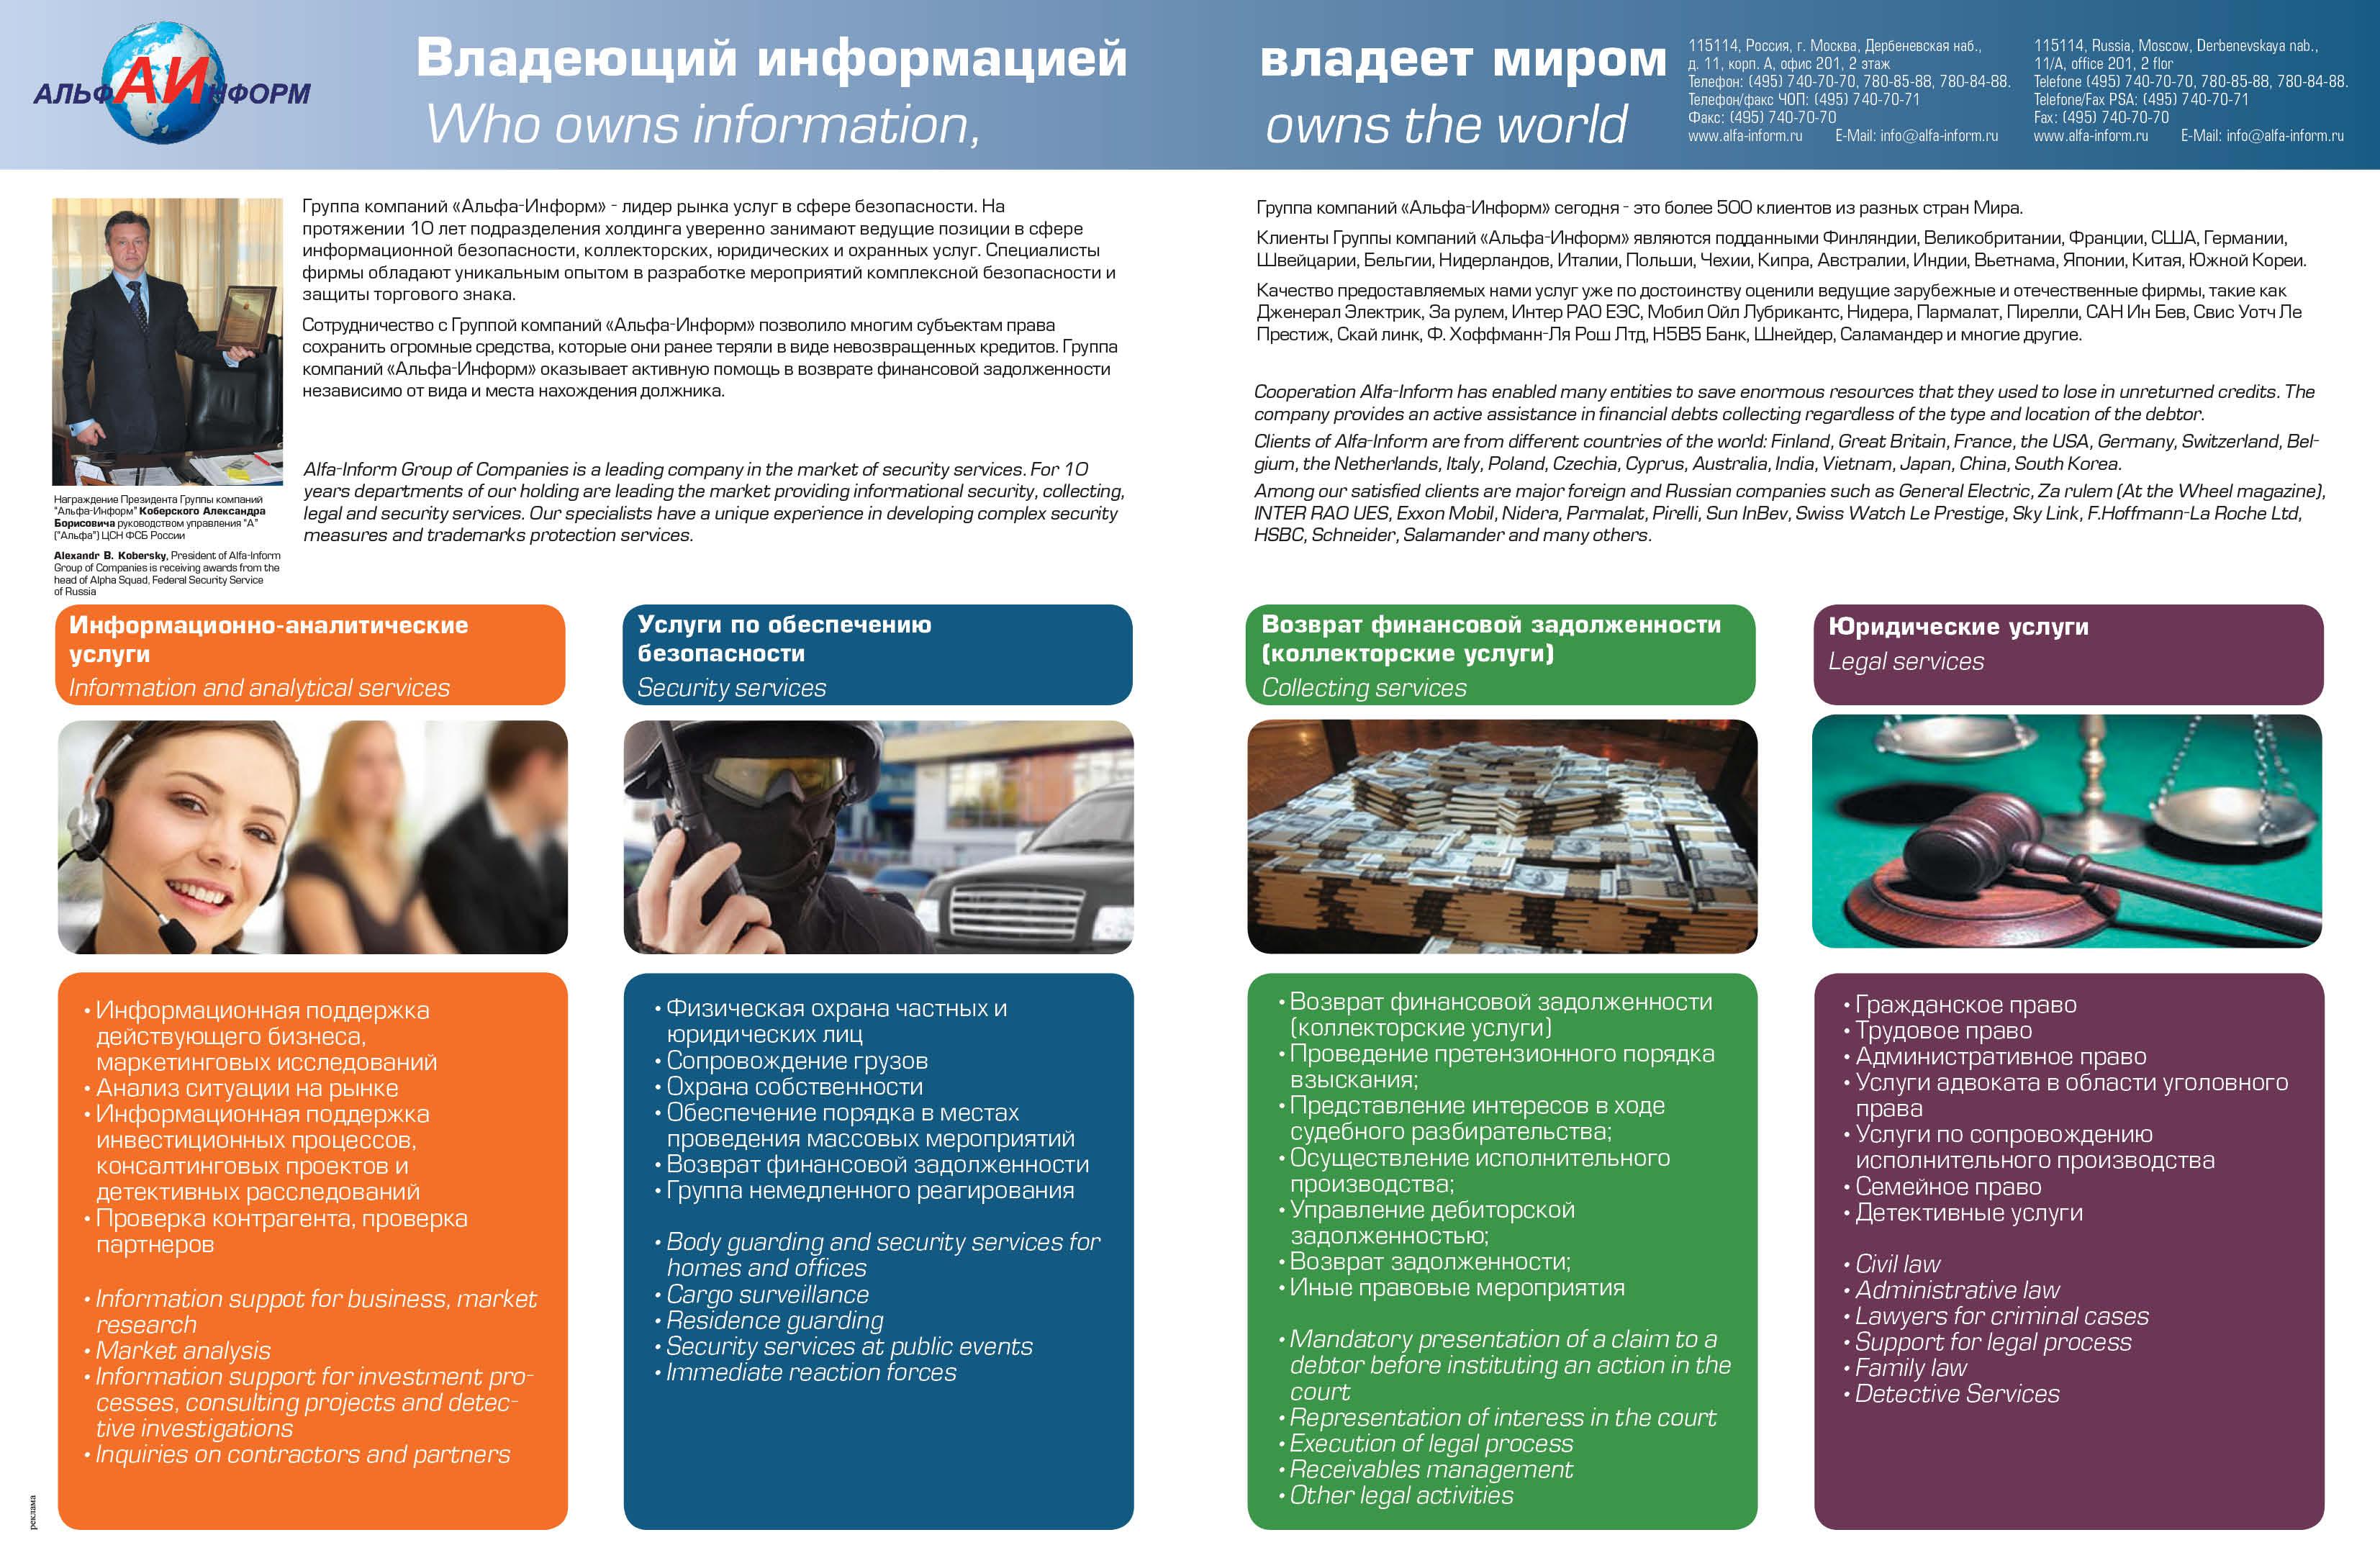 http://www.alfa-inform.ru/assets/templates/alfa/images/alfainform.jpg